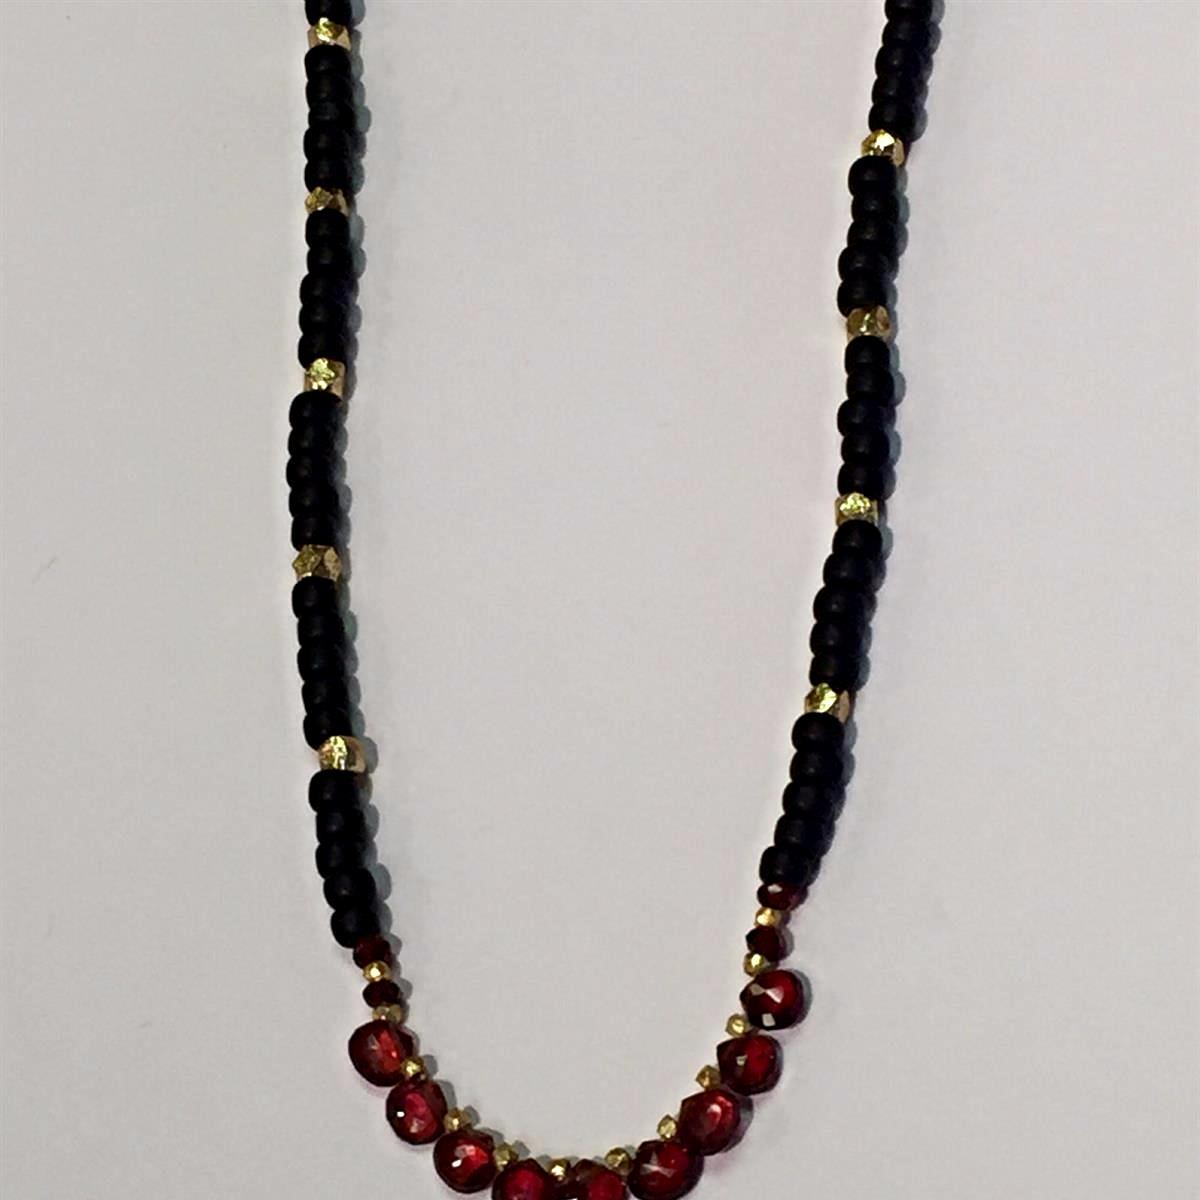 Garnet Onyx Necklace